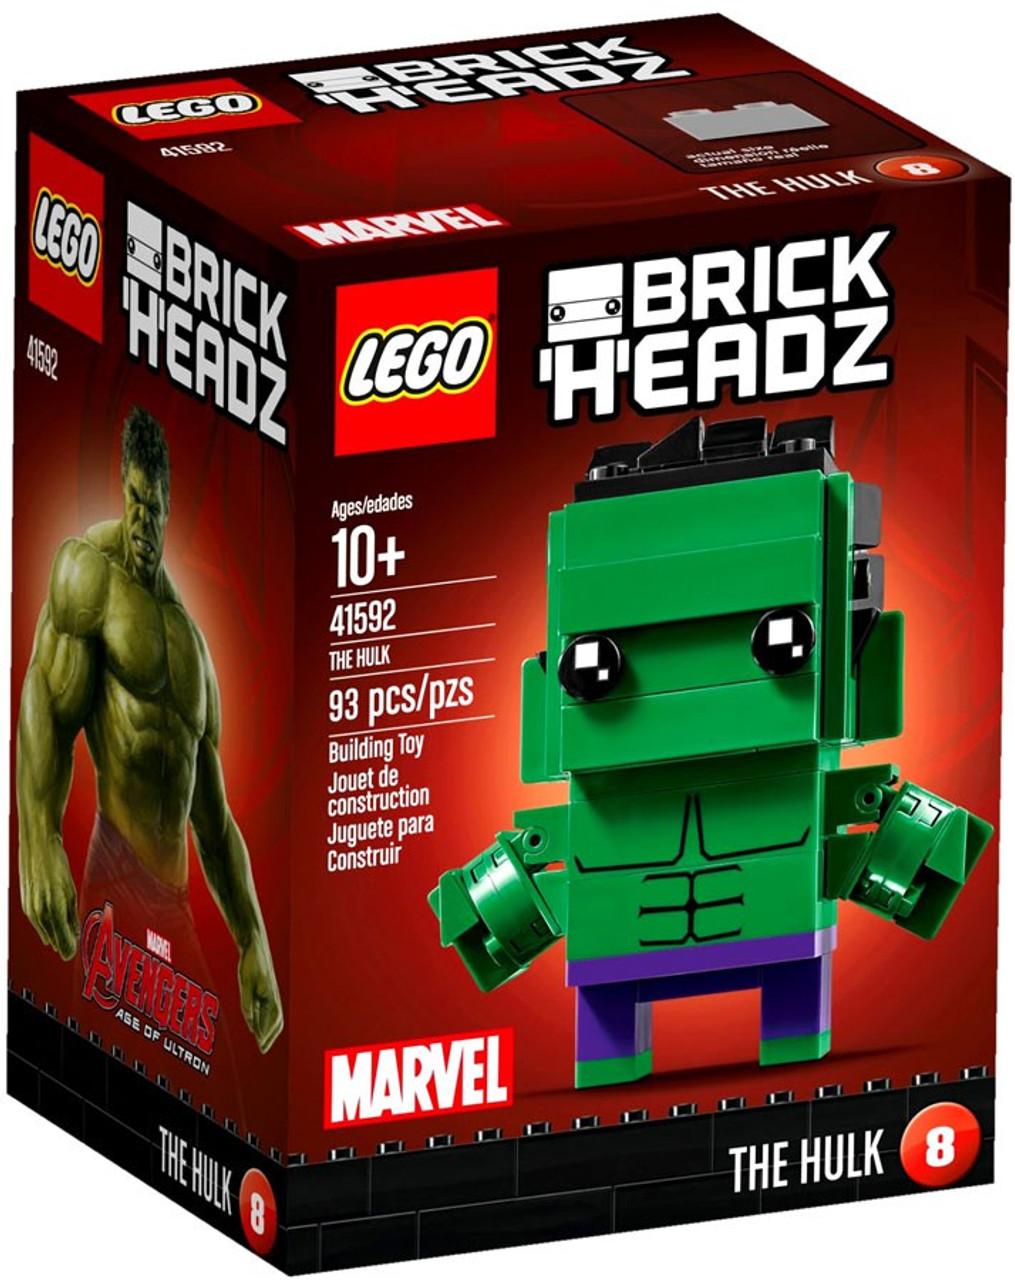 Marvel Avengers Set The Mini Headz Of Hulk Lego Ultron Age Brick 6vYfgb7y